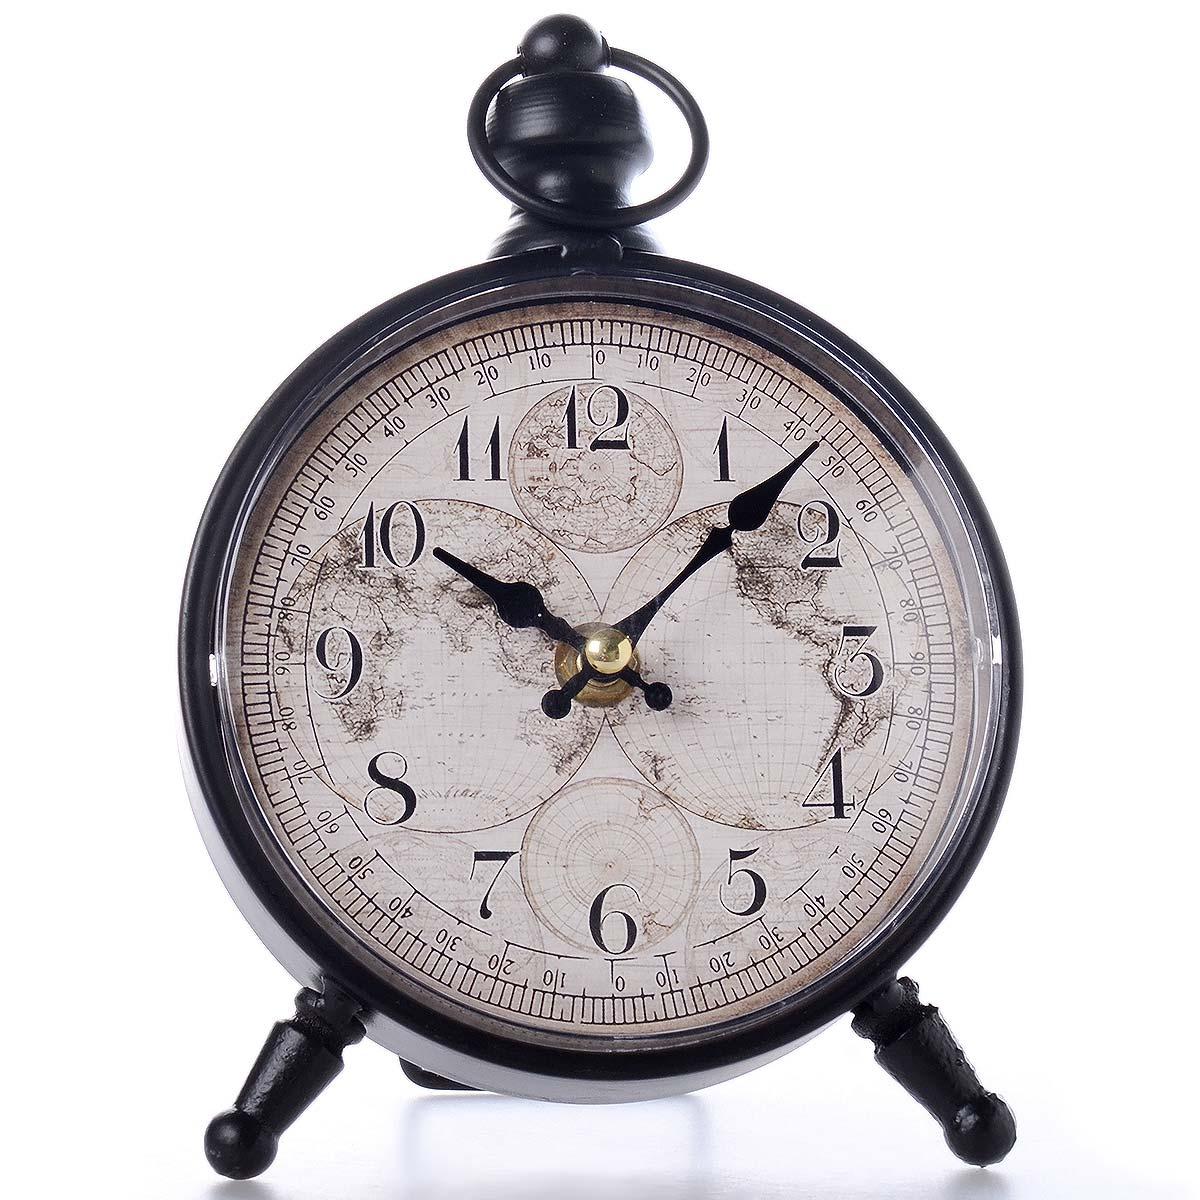 Vintage χειροποίητο διακοσμητικό ρολόι μεταλλικό - OEM 51537